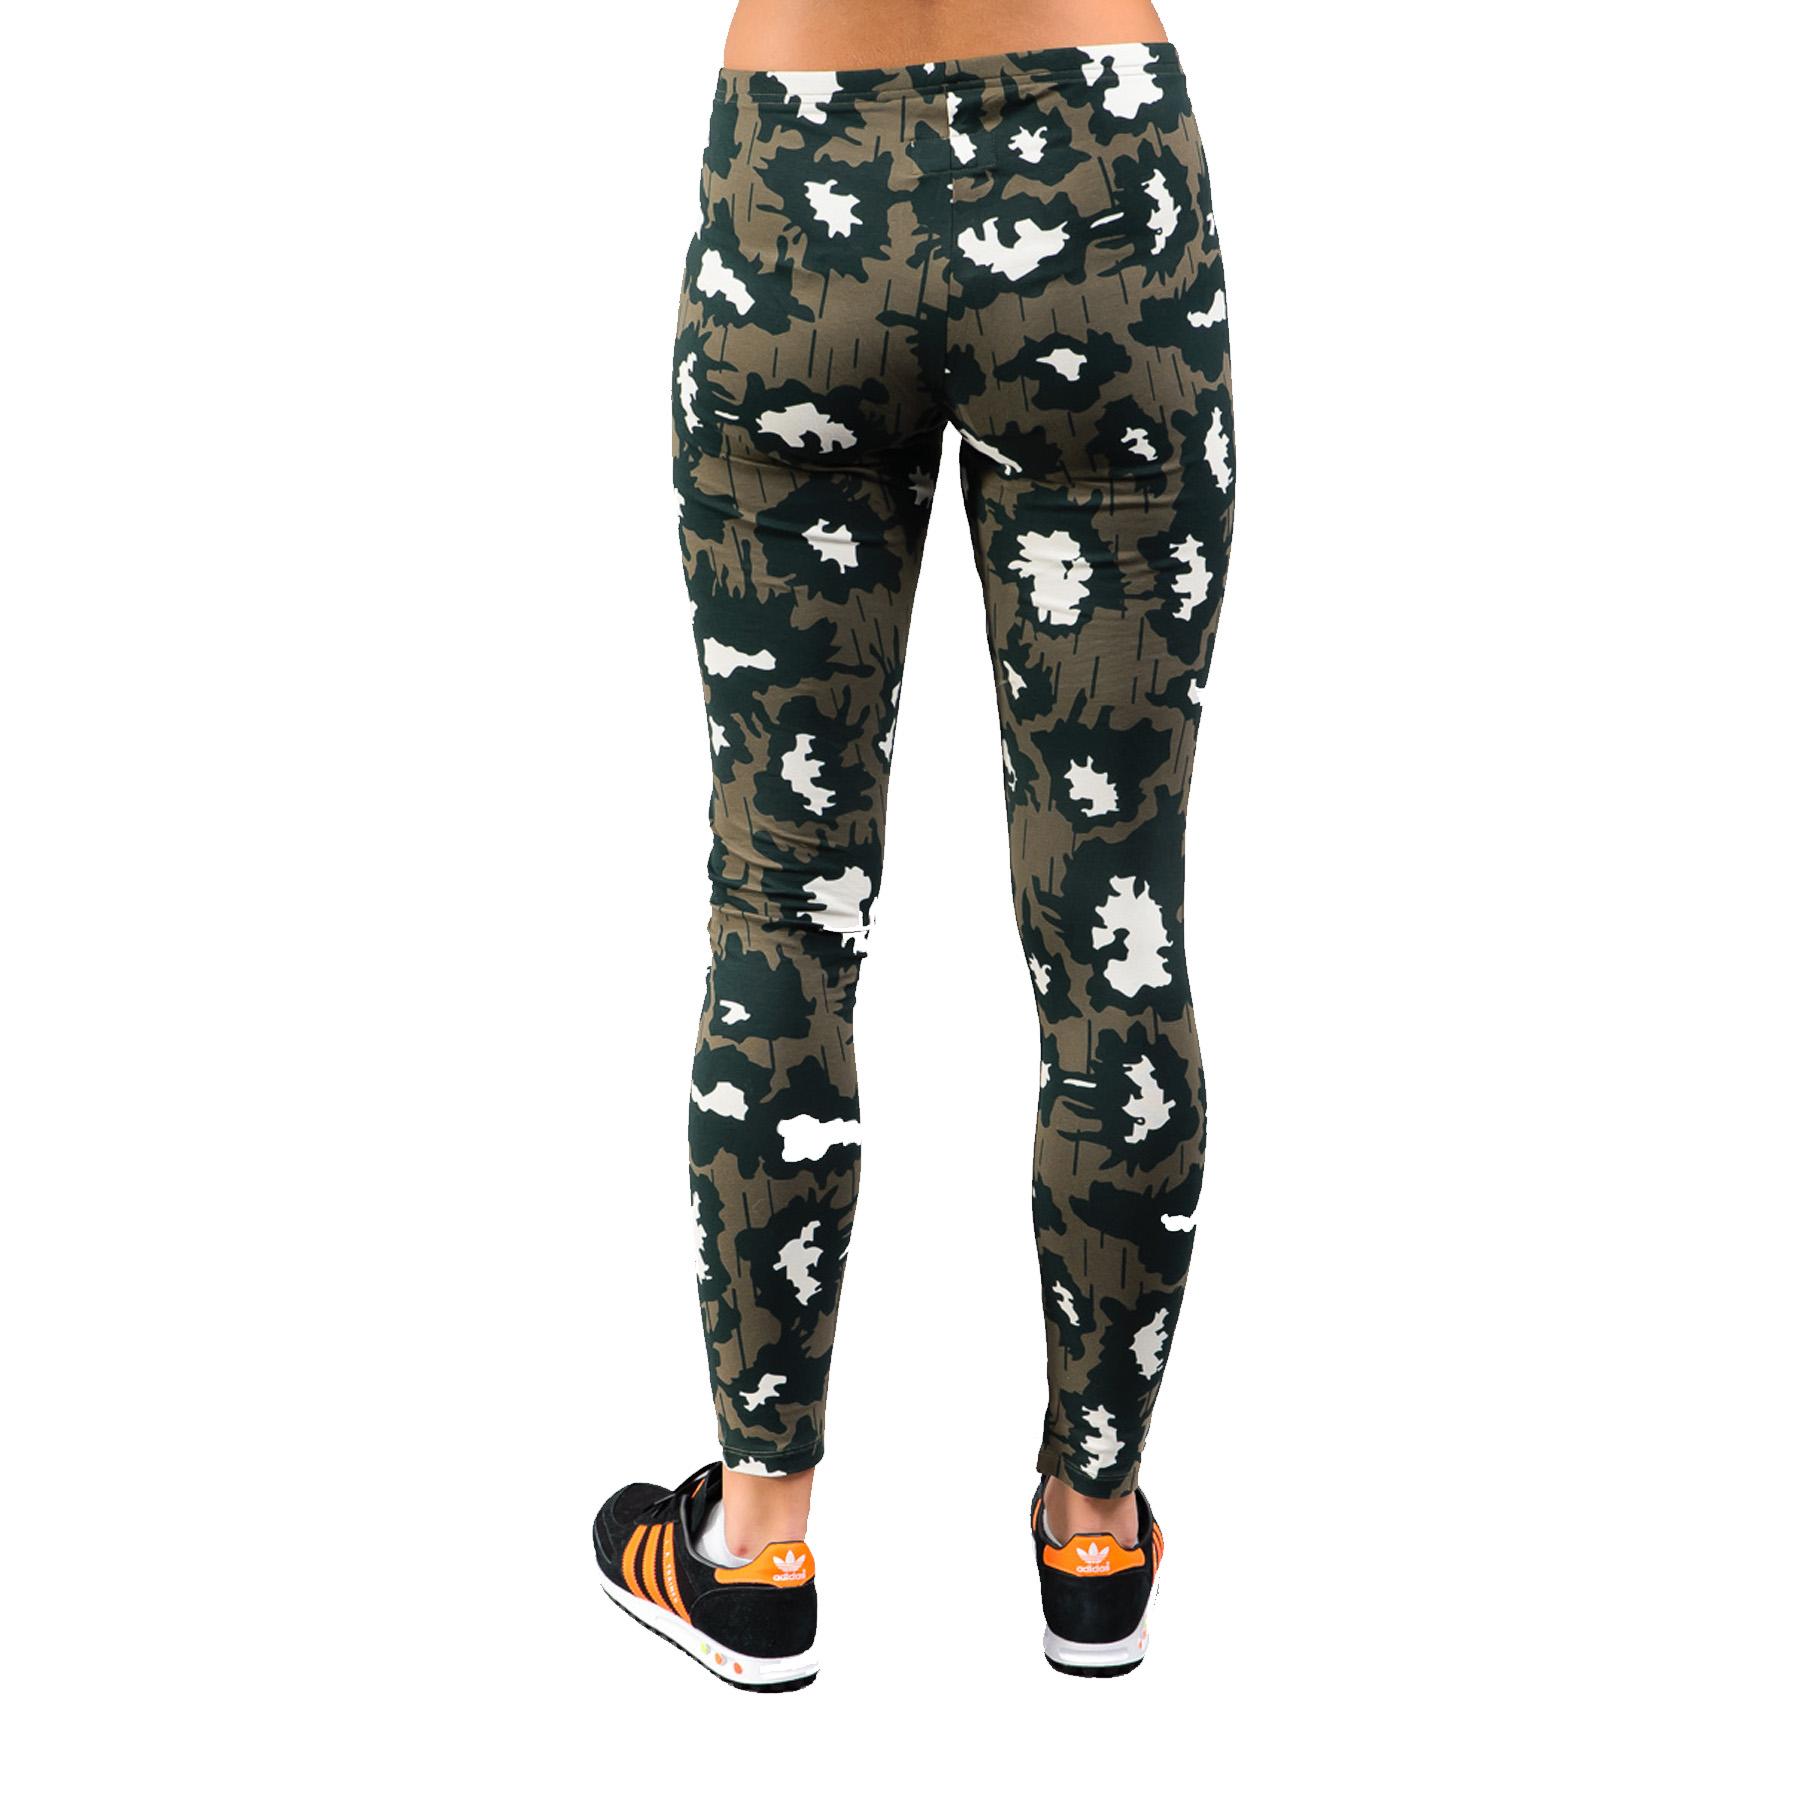 Wonderful Adidas Leaf Camo Leggings  Womens Pants From PacSun